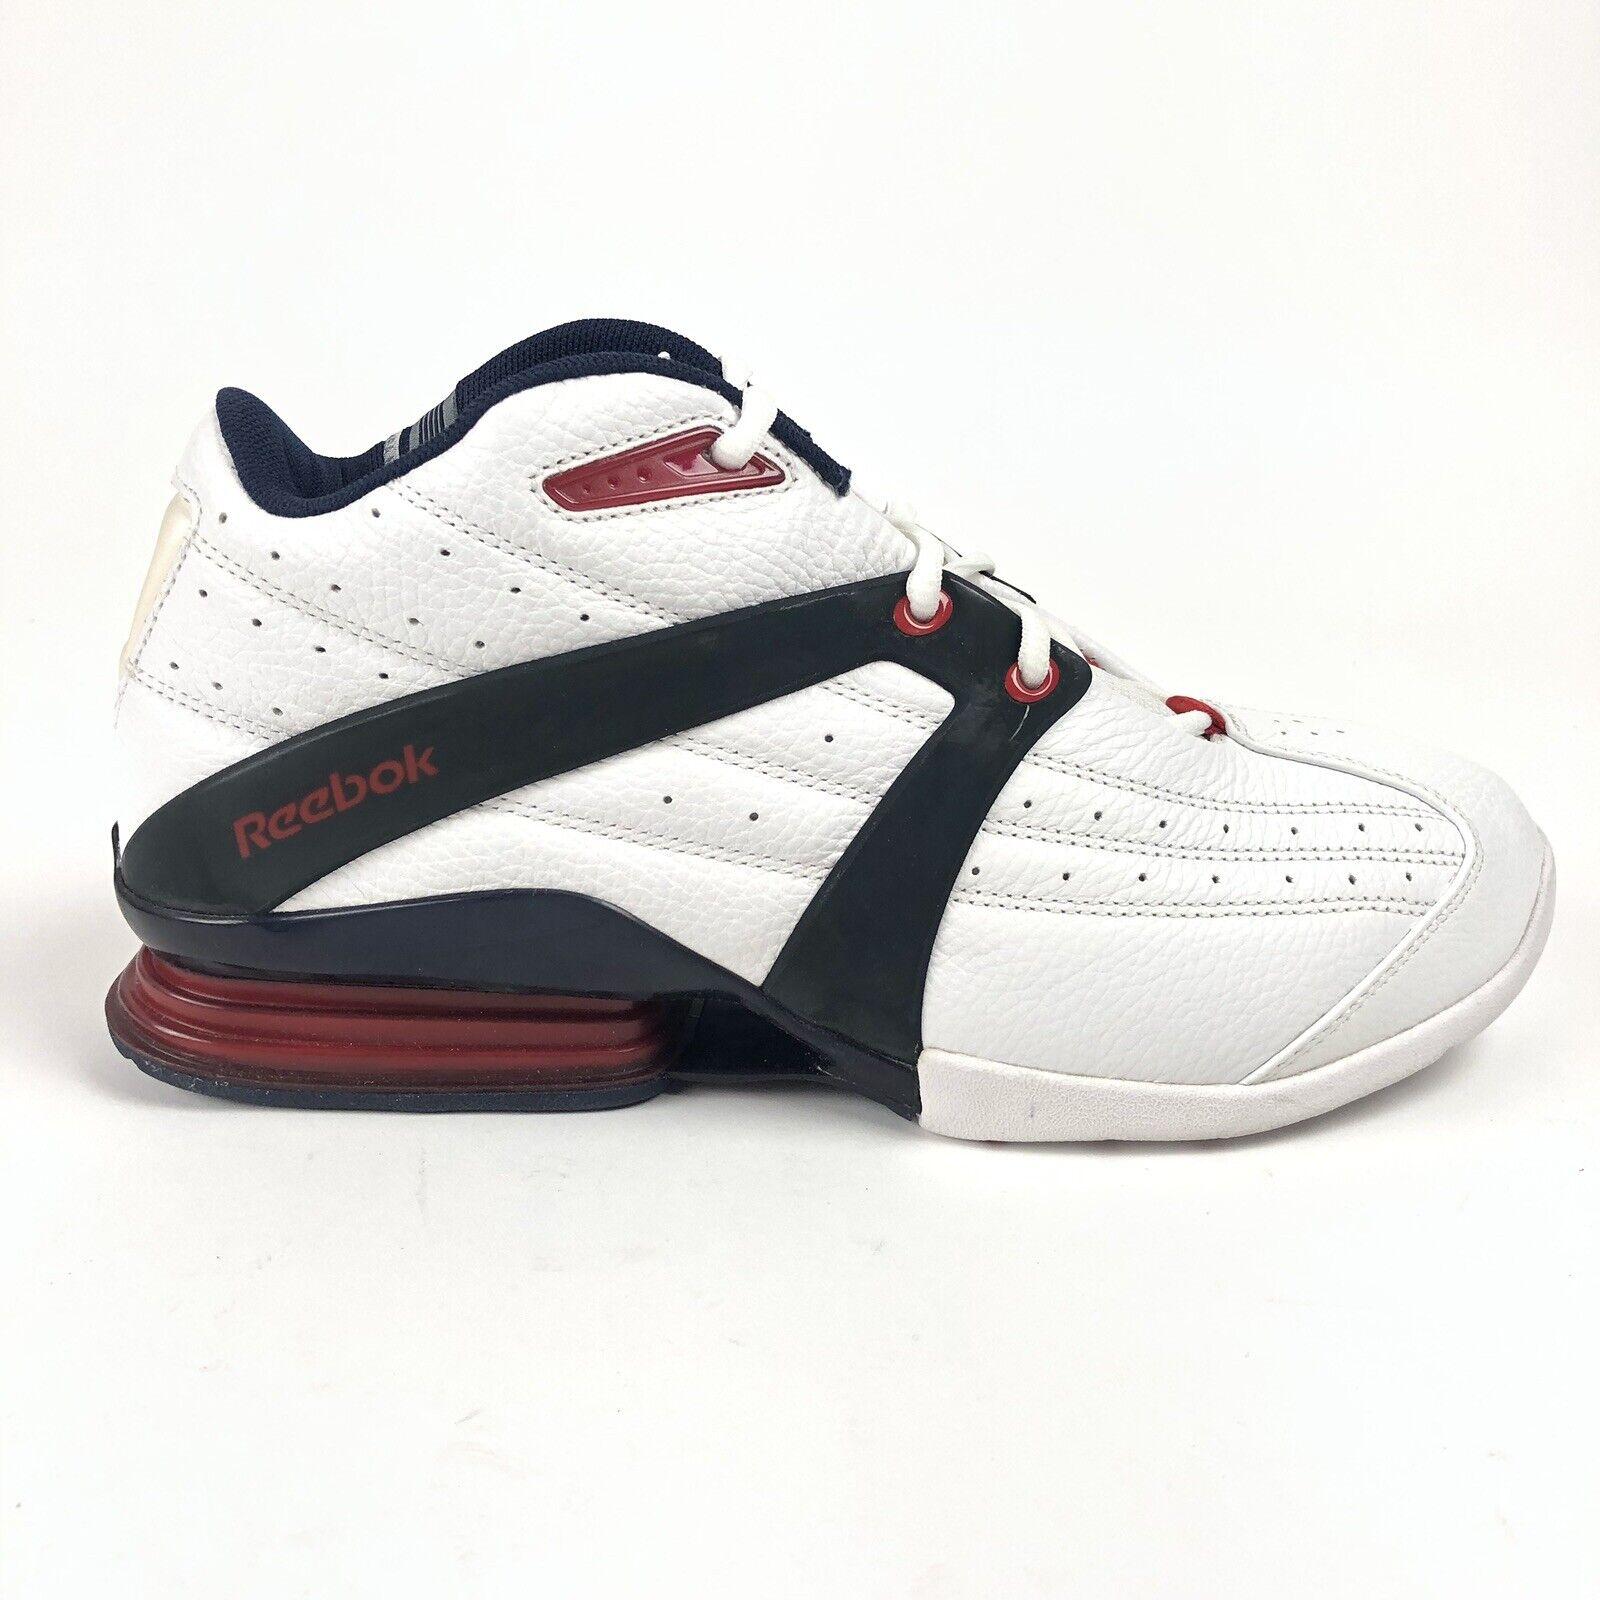 Reebok Hesitation Mens 13 NBA DMX Flex Basketball shoes 4-99689